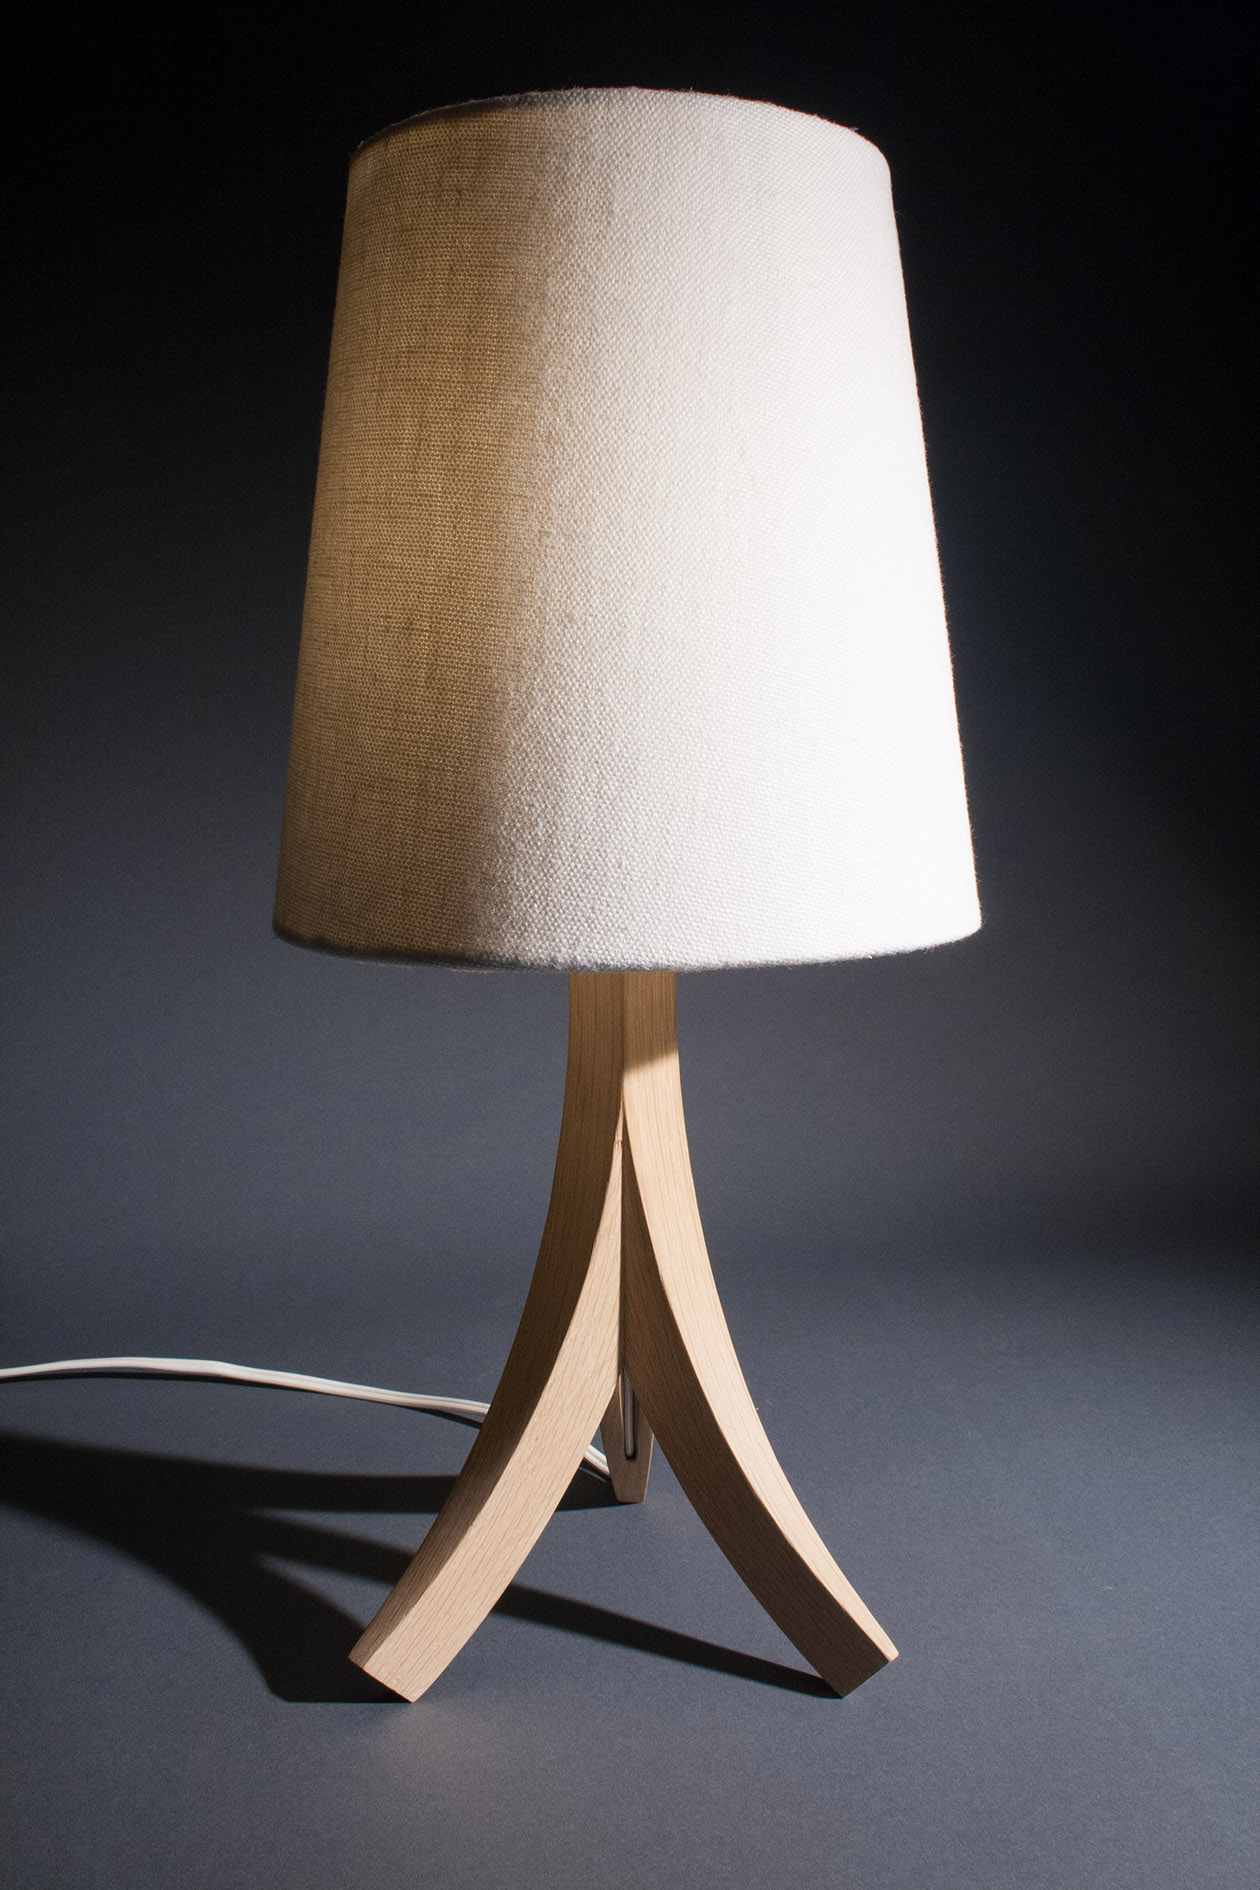 tusk lamp mood shot.jpg